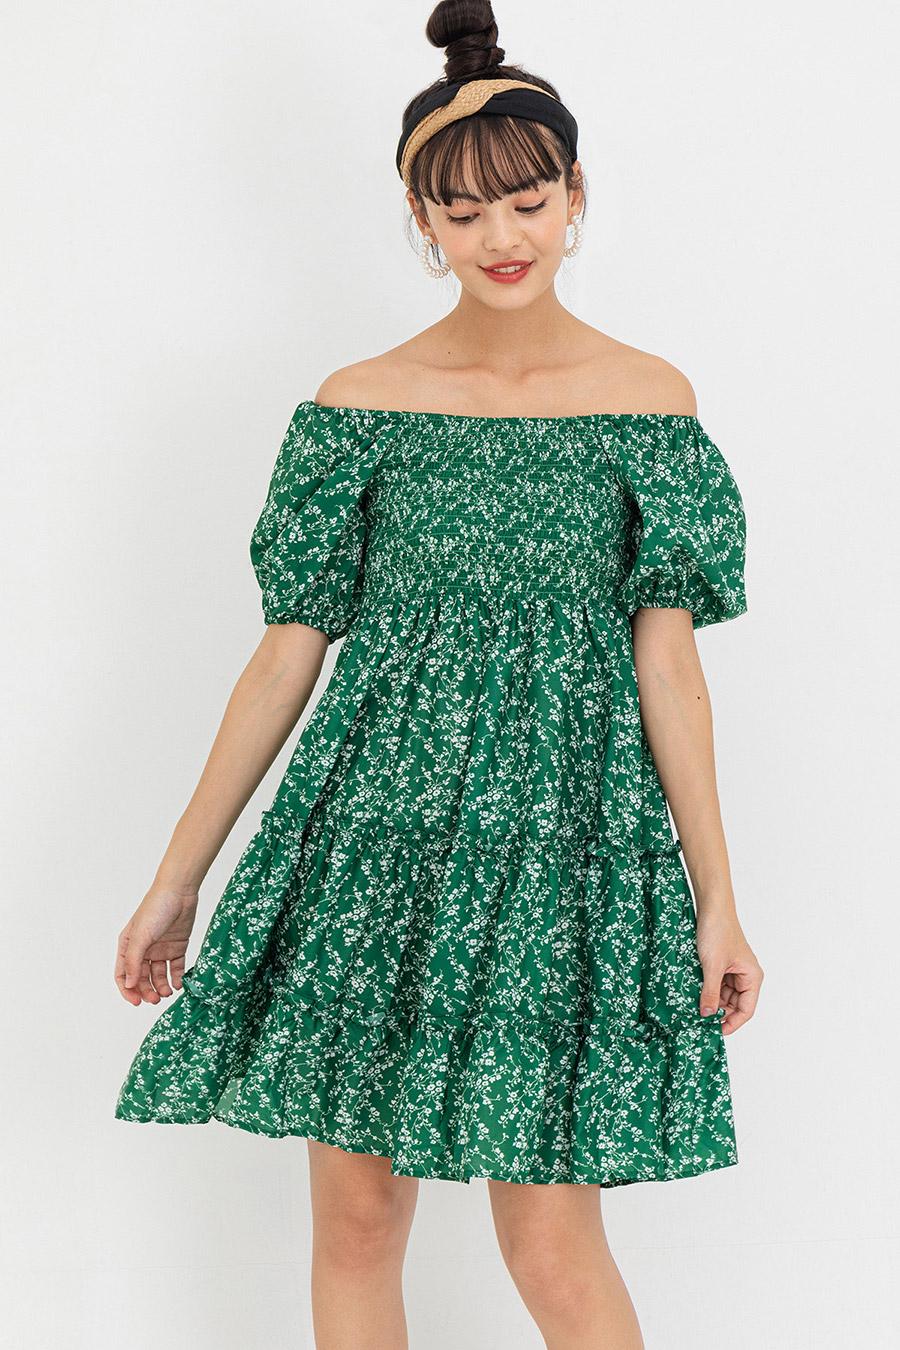 CESAR DRESS - BONSAI FLEUR